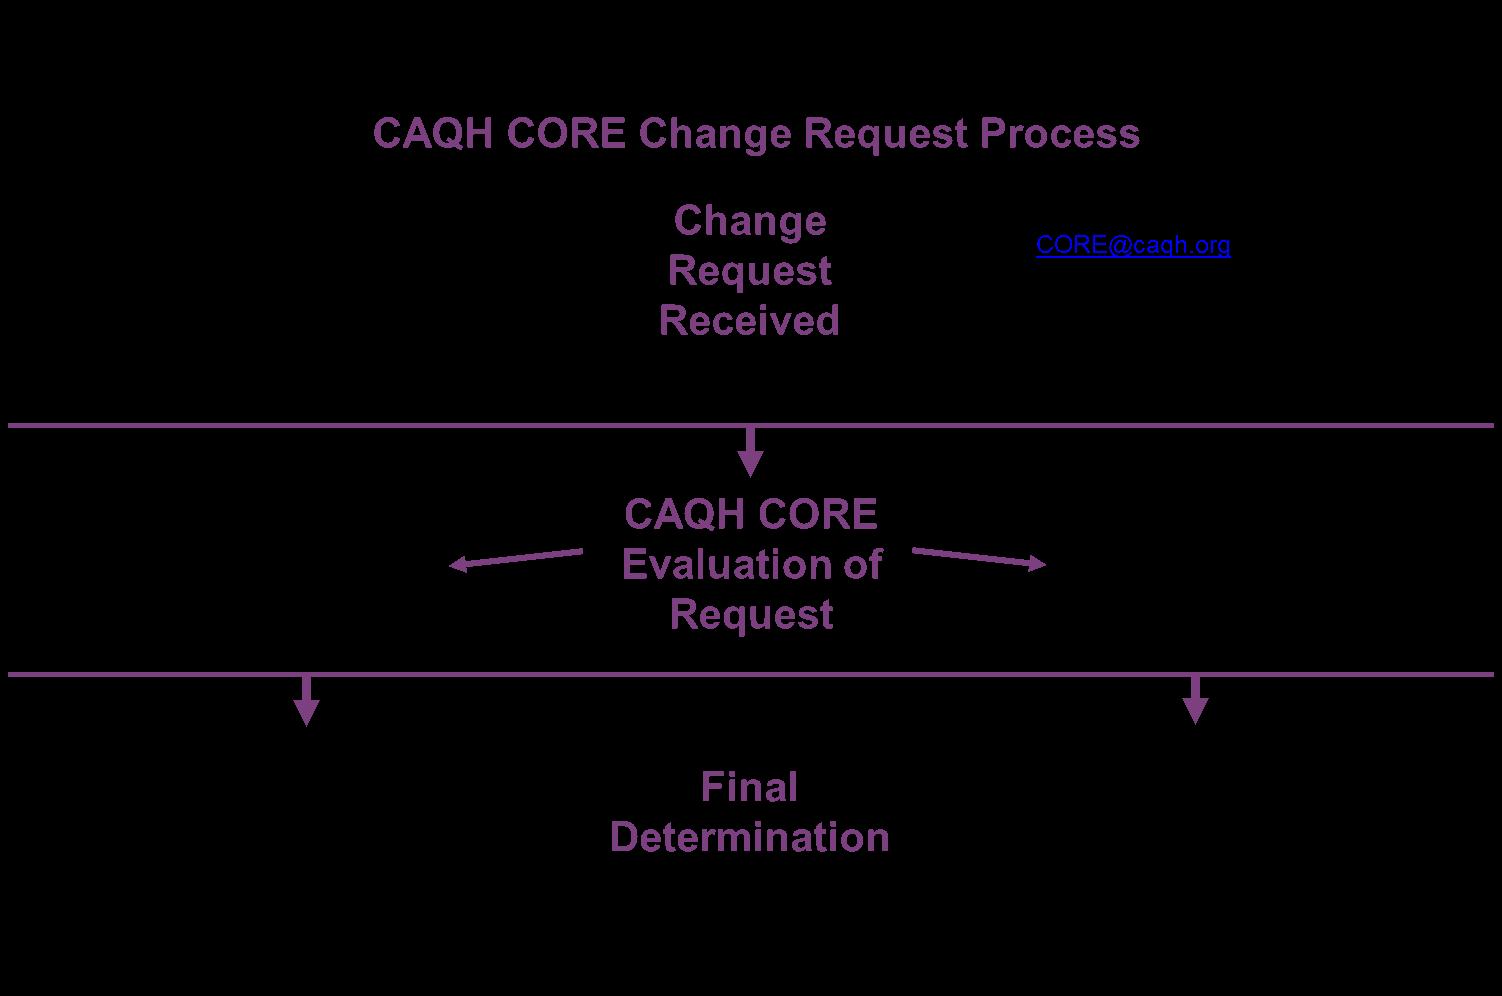 CAQH CORE Change Request Process image